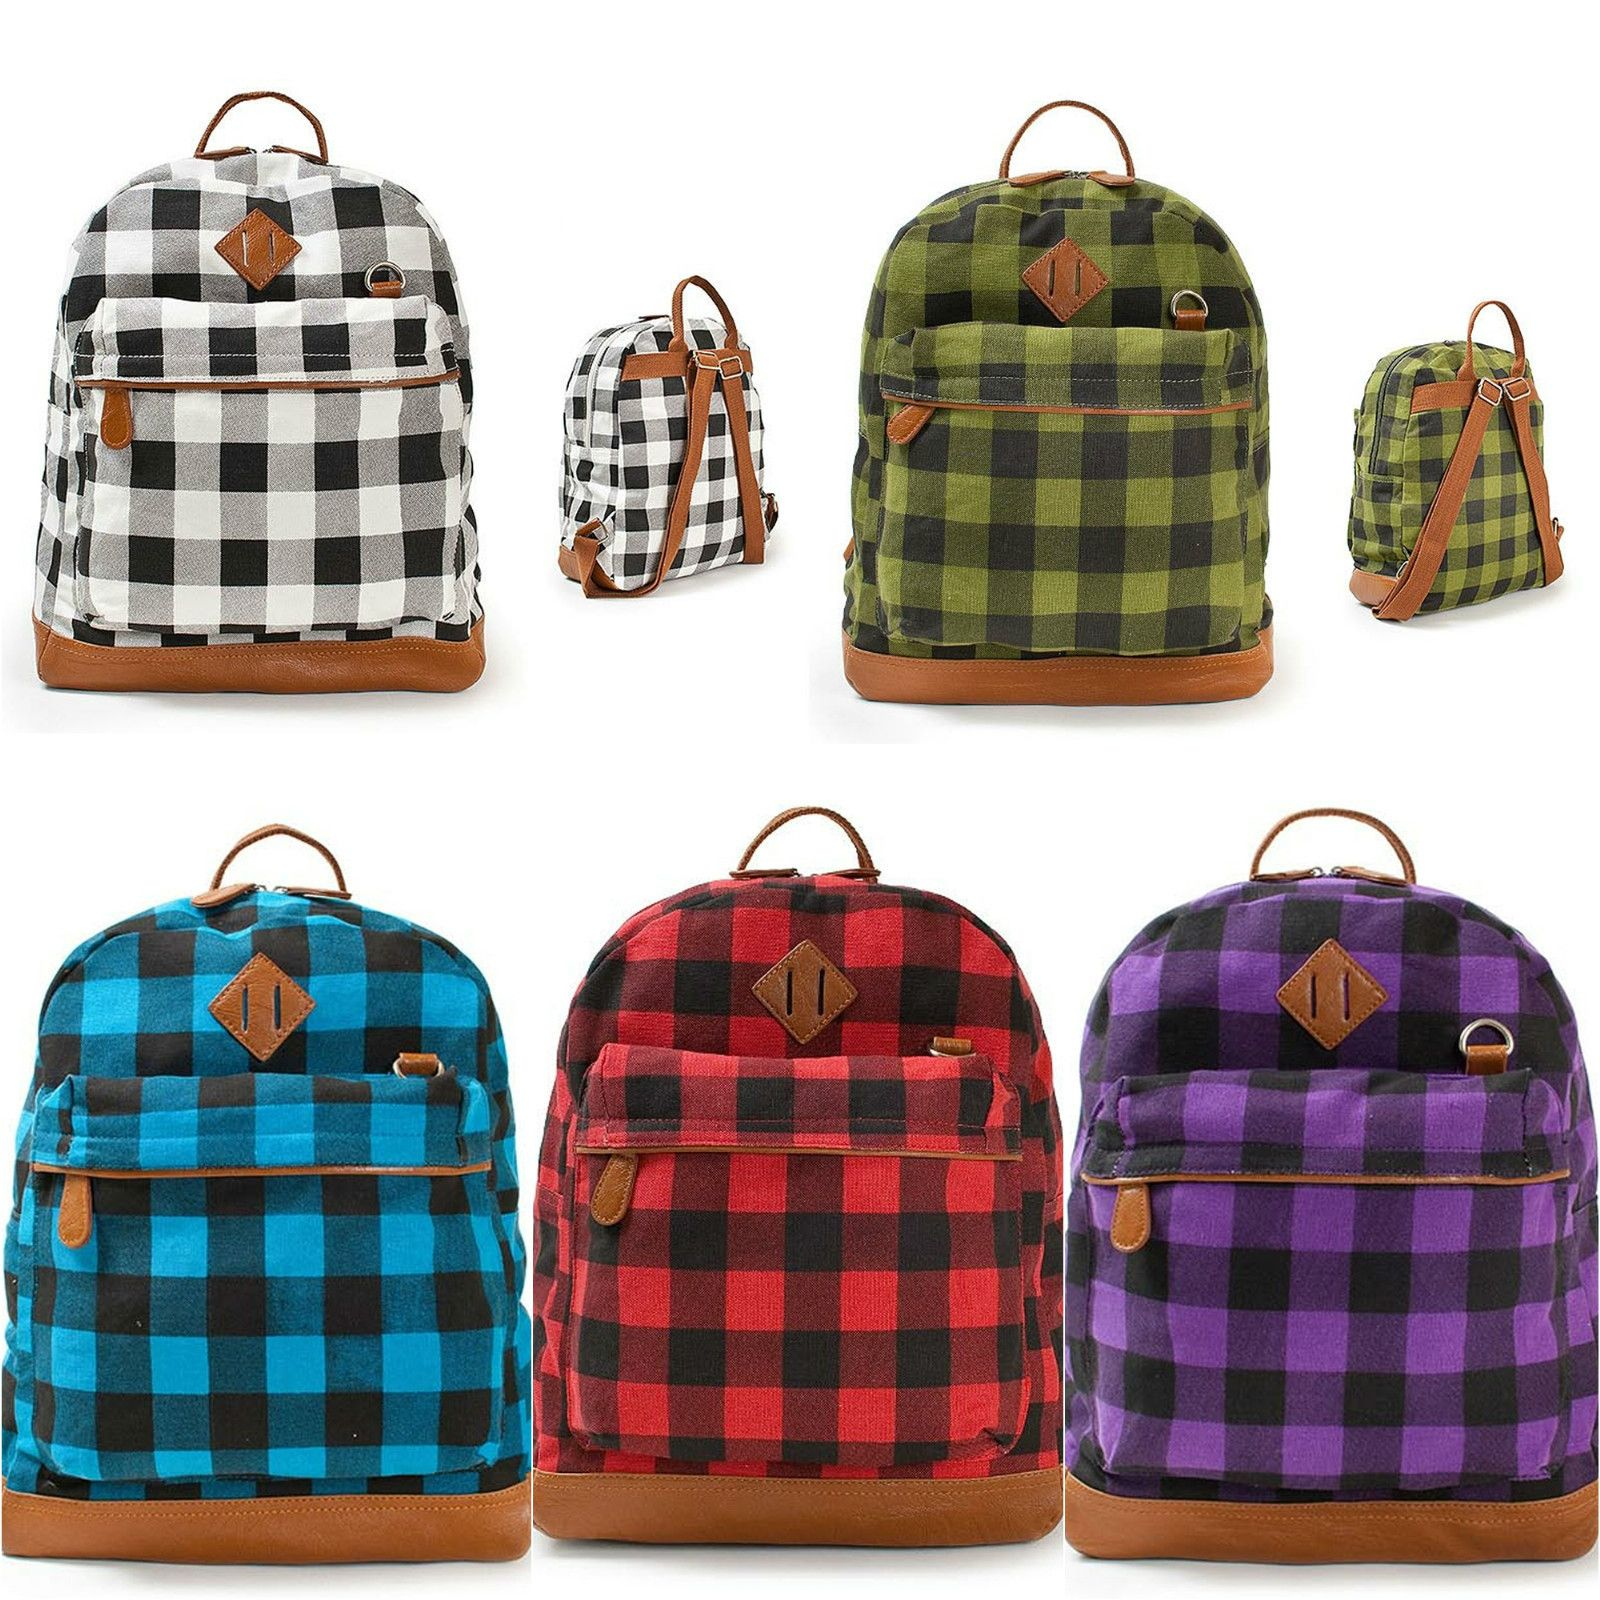 MENS WOMENS Colorful Check Plaid Patterns BACKPACKS SCHOOL BAG